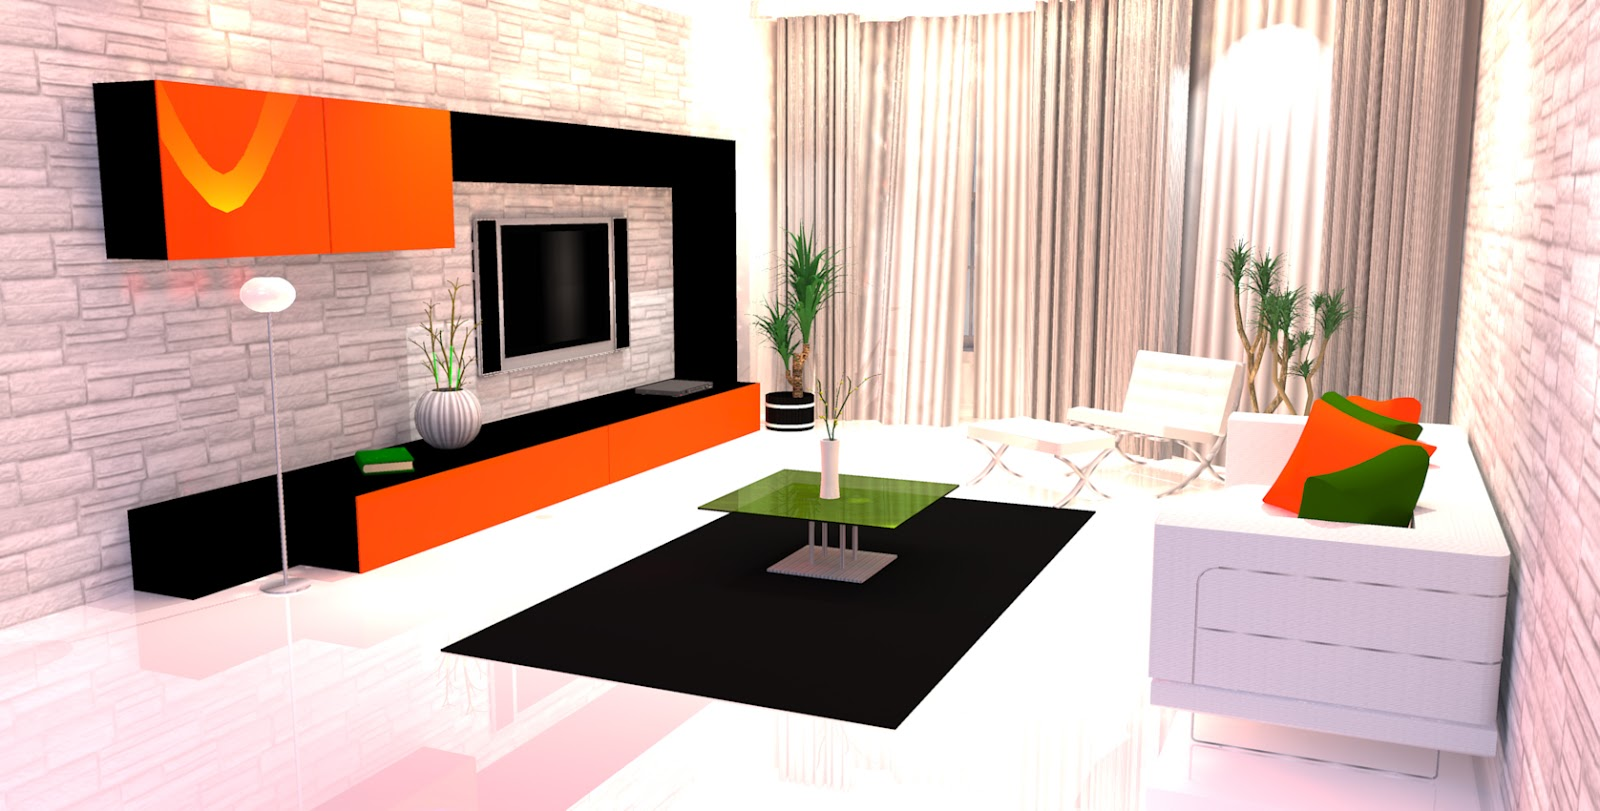 Deco salon moderne 2015 decoration maison moderne for Decoration interieur moderne salon